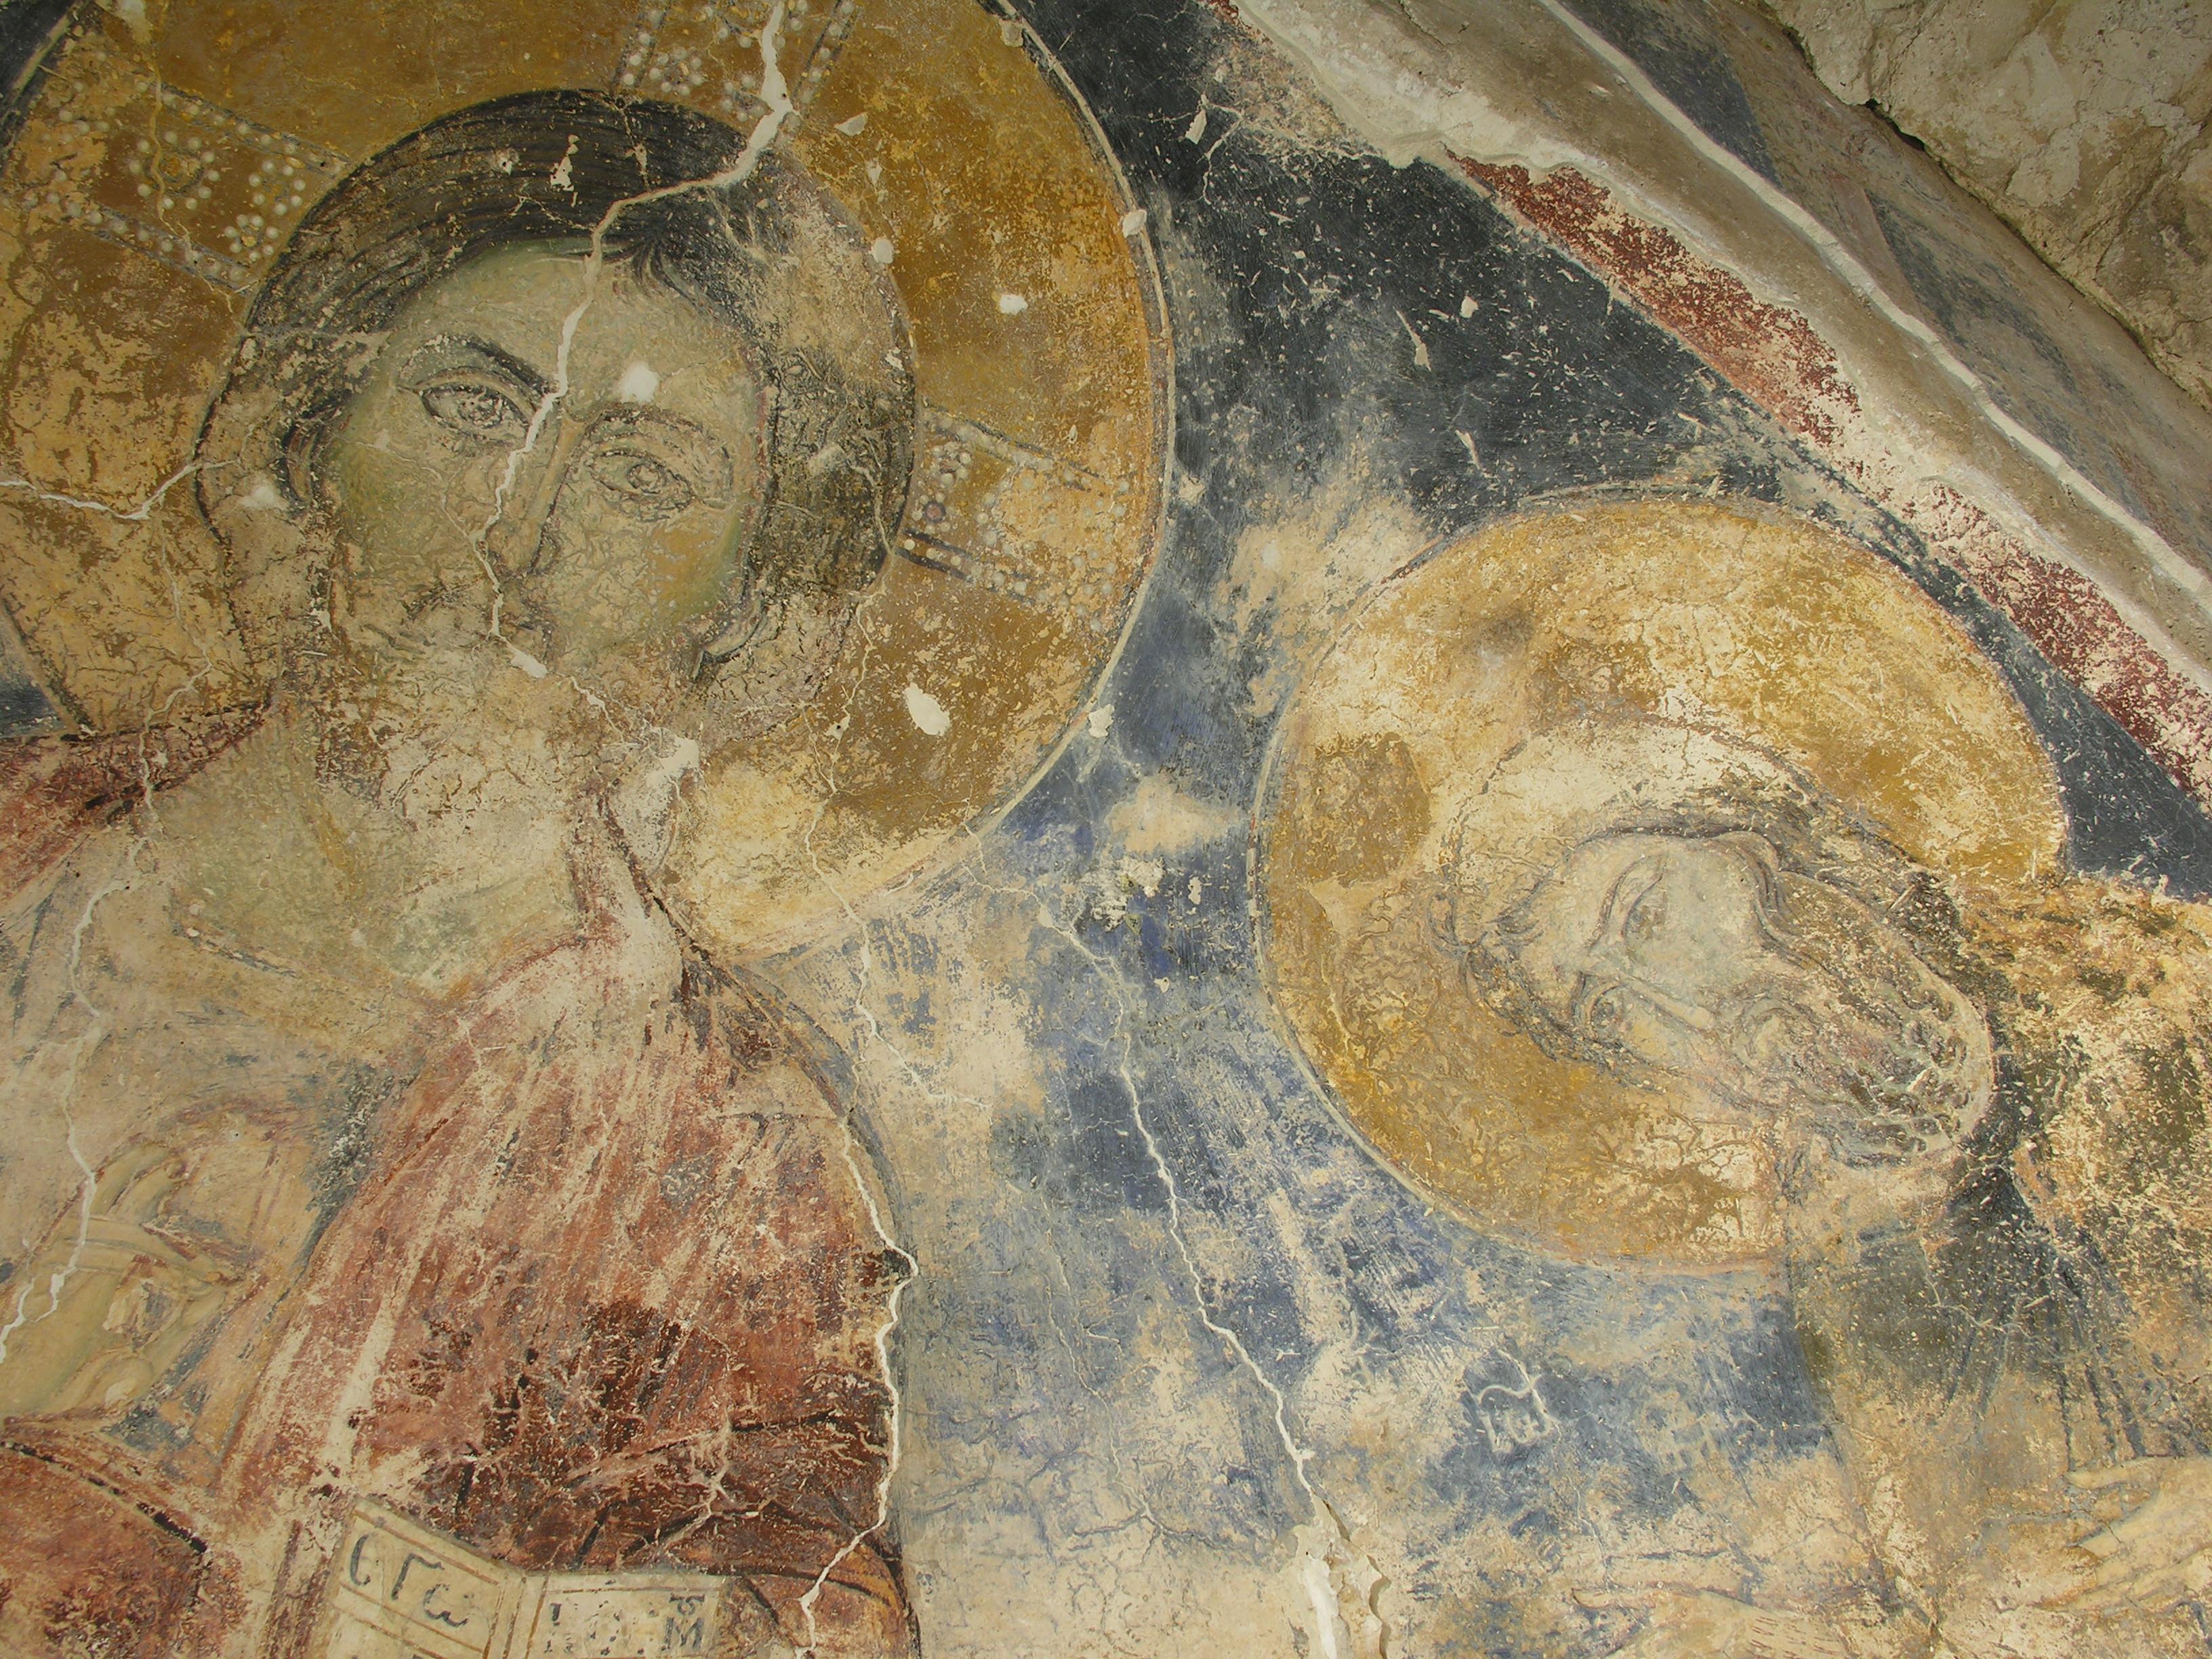 Fig. 6: Christ and Saint John the Baptist in the Deesis scene (Waliszewski and Chmielewski 2009–2010)